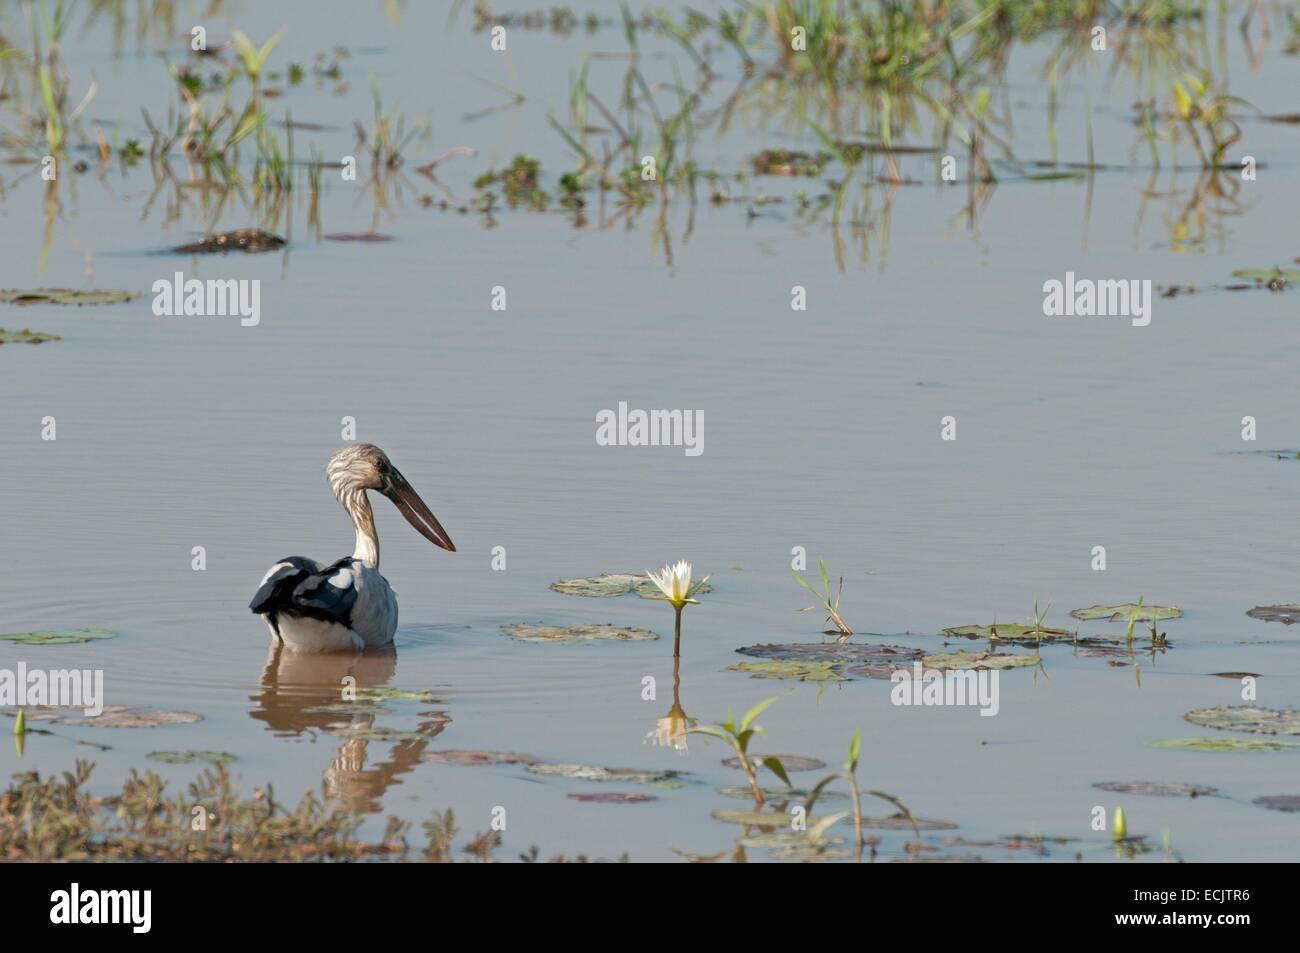 Thailand, India open mouthpiece (Anastomus oscitans) - Stock Image